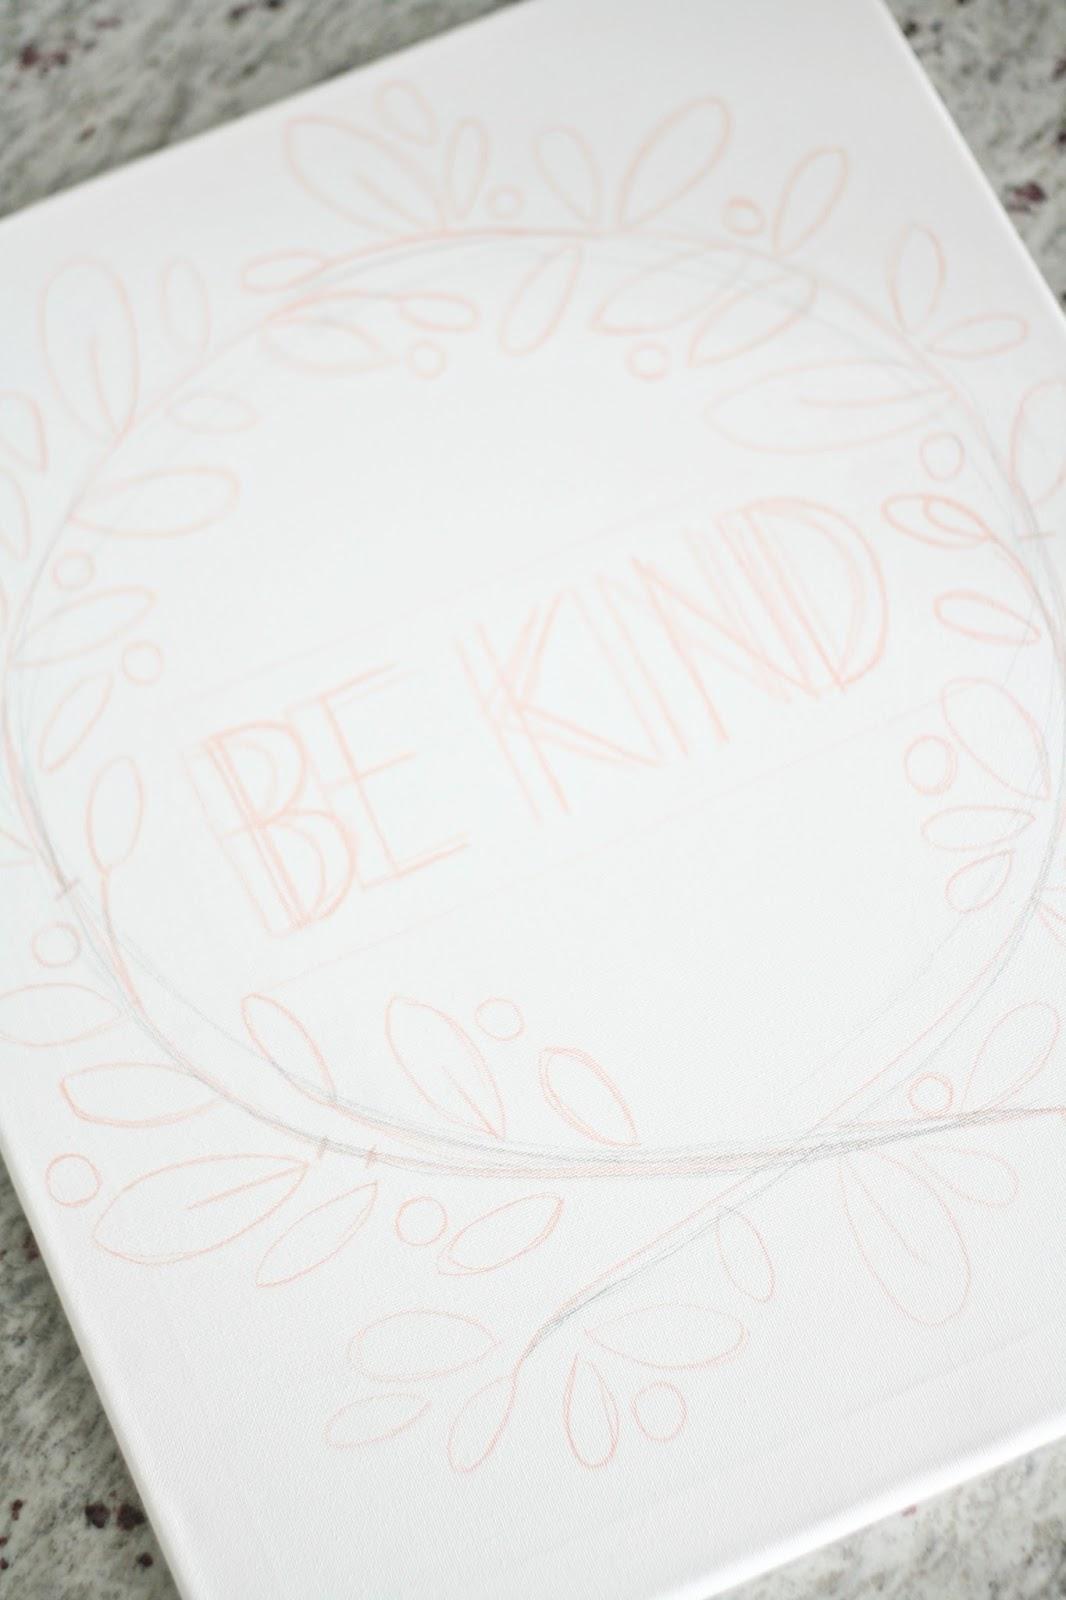 DIY Canvas and Glue Art - The Pretty Life Girls